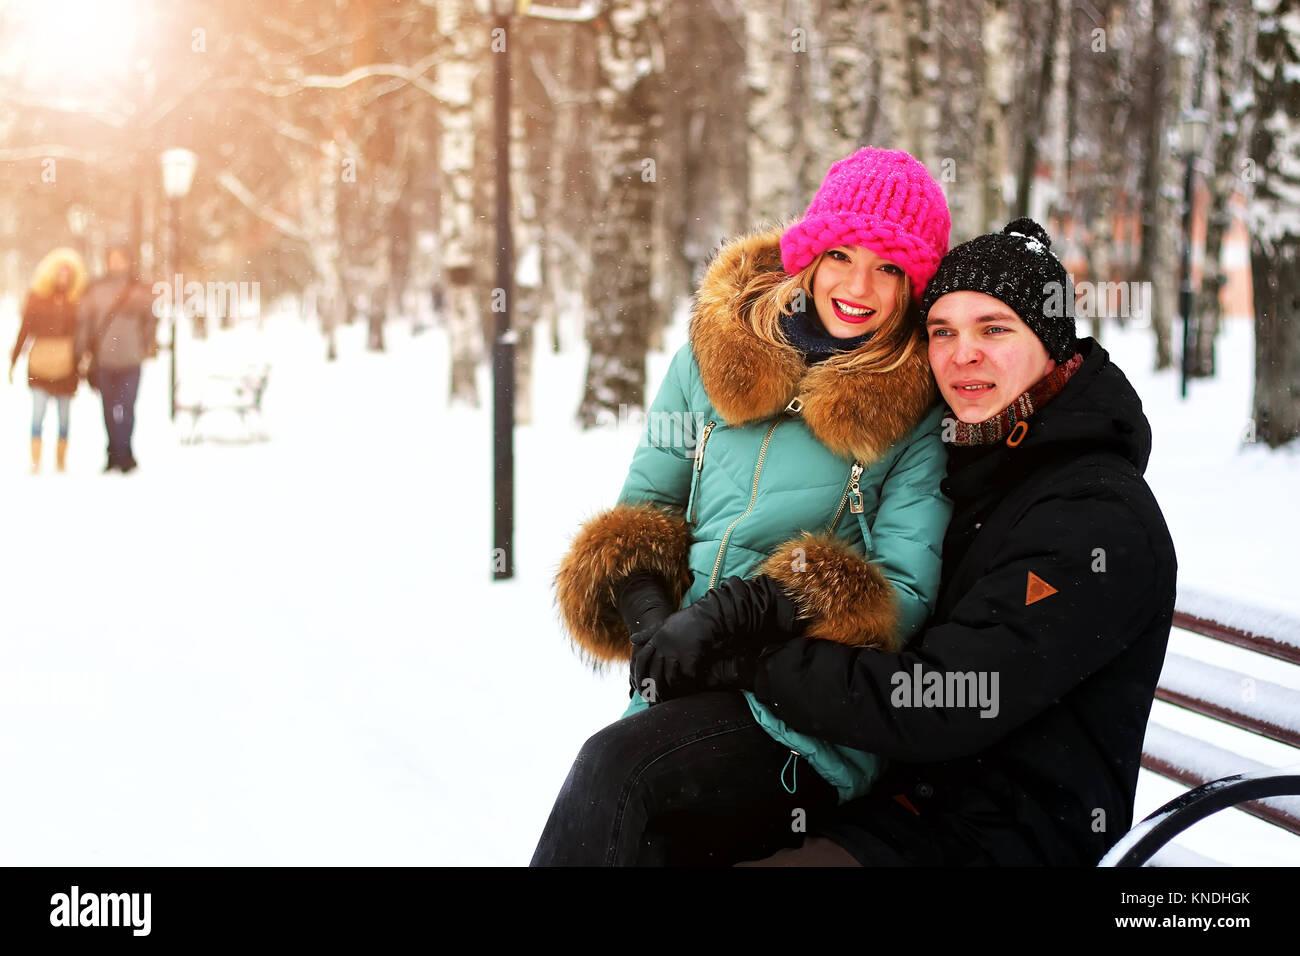 lover heterosexuals on a date in the winter - Stock Image